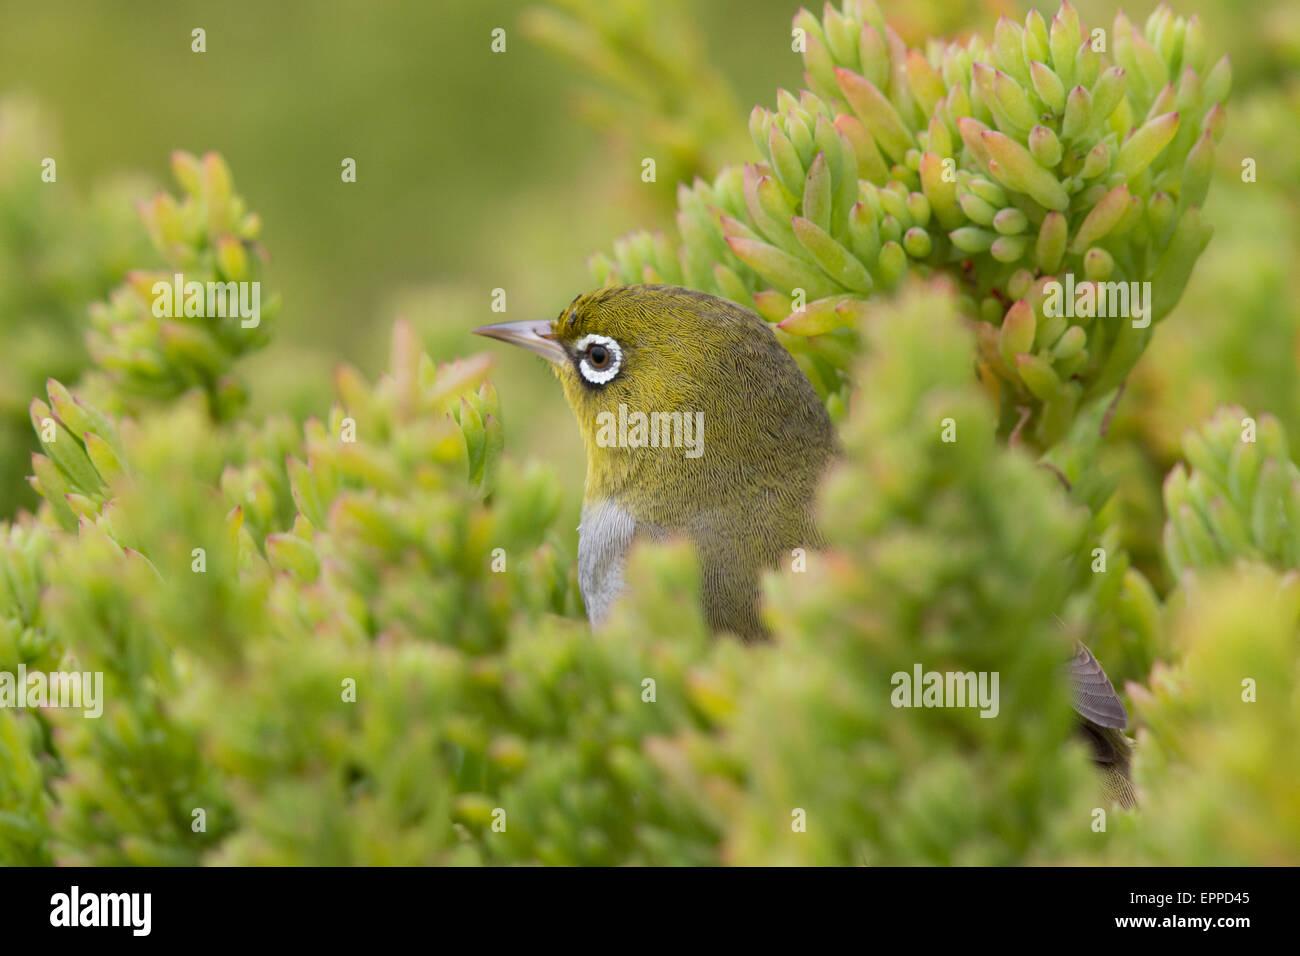 Silvereye (Zosterops lateralis) - Stock Image